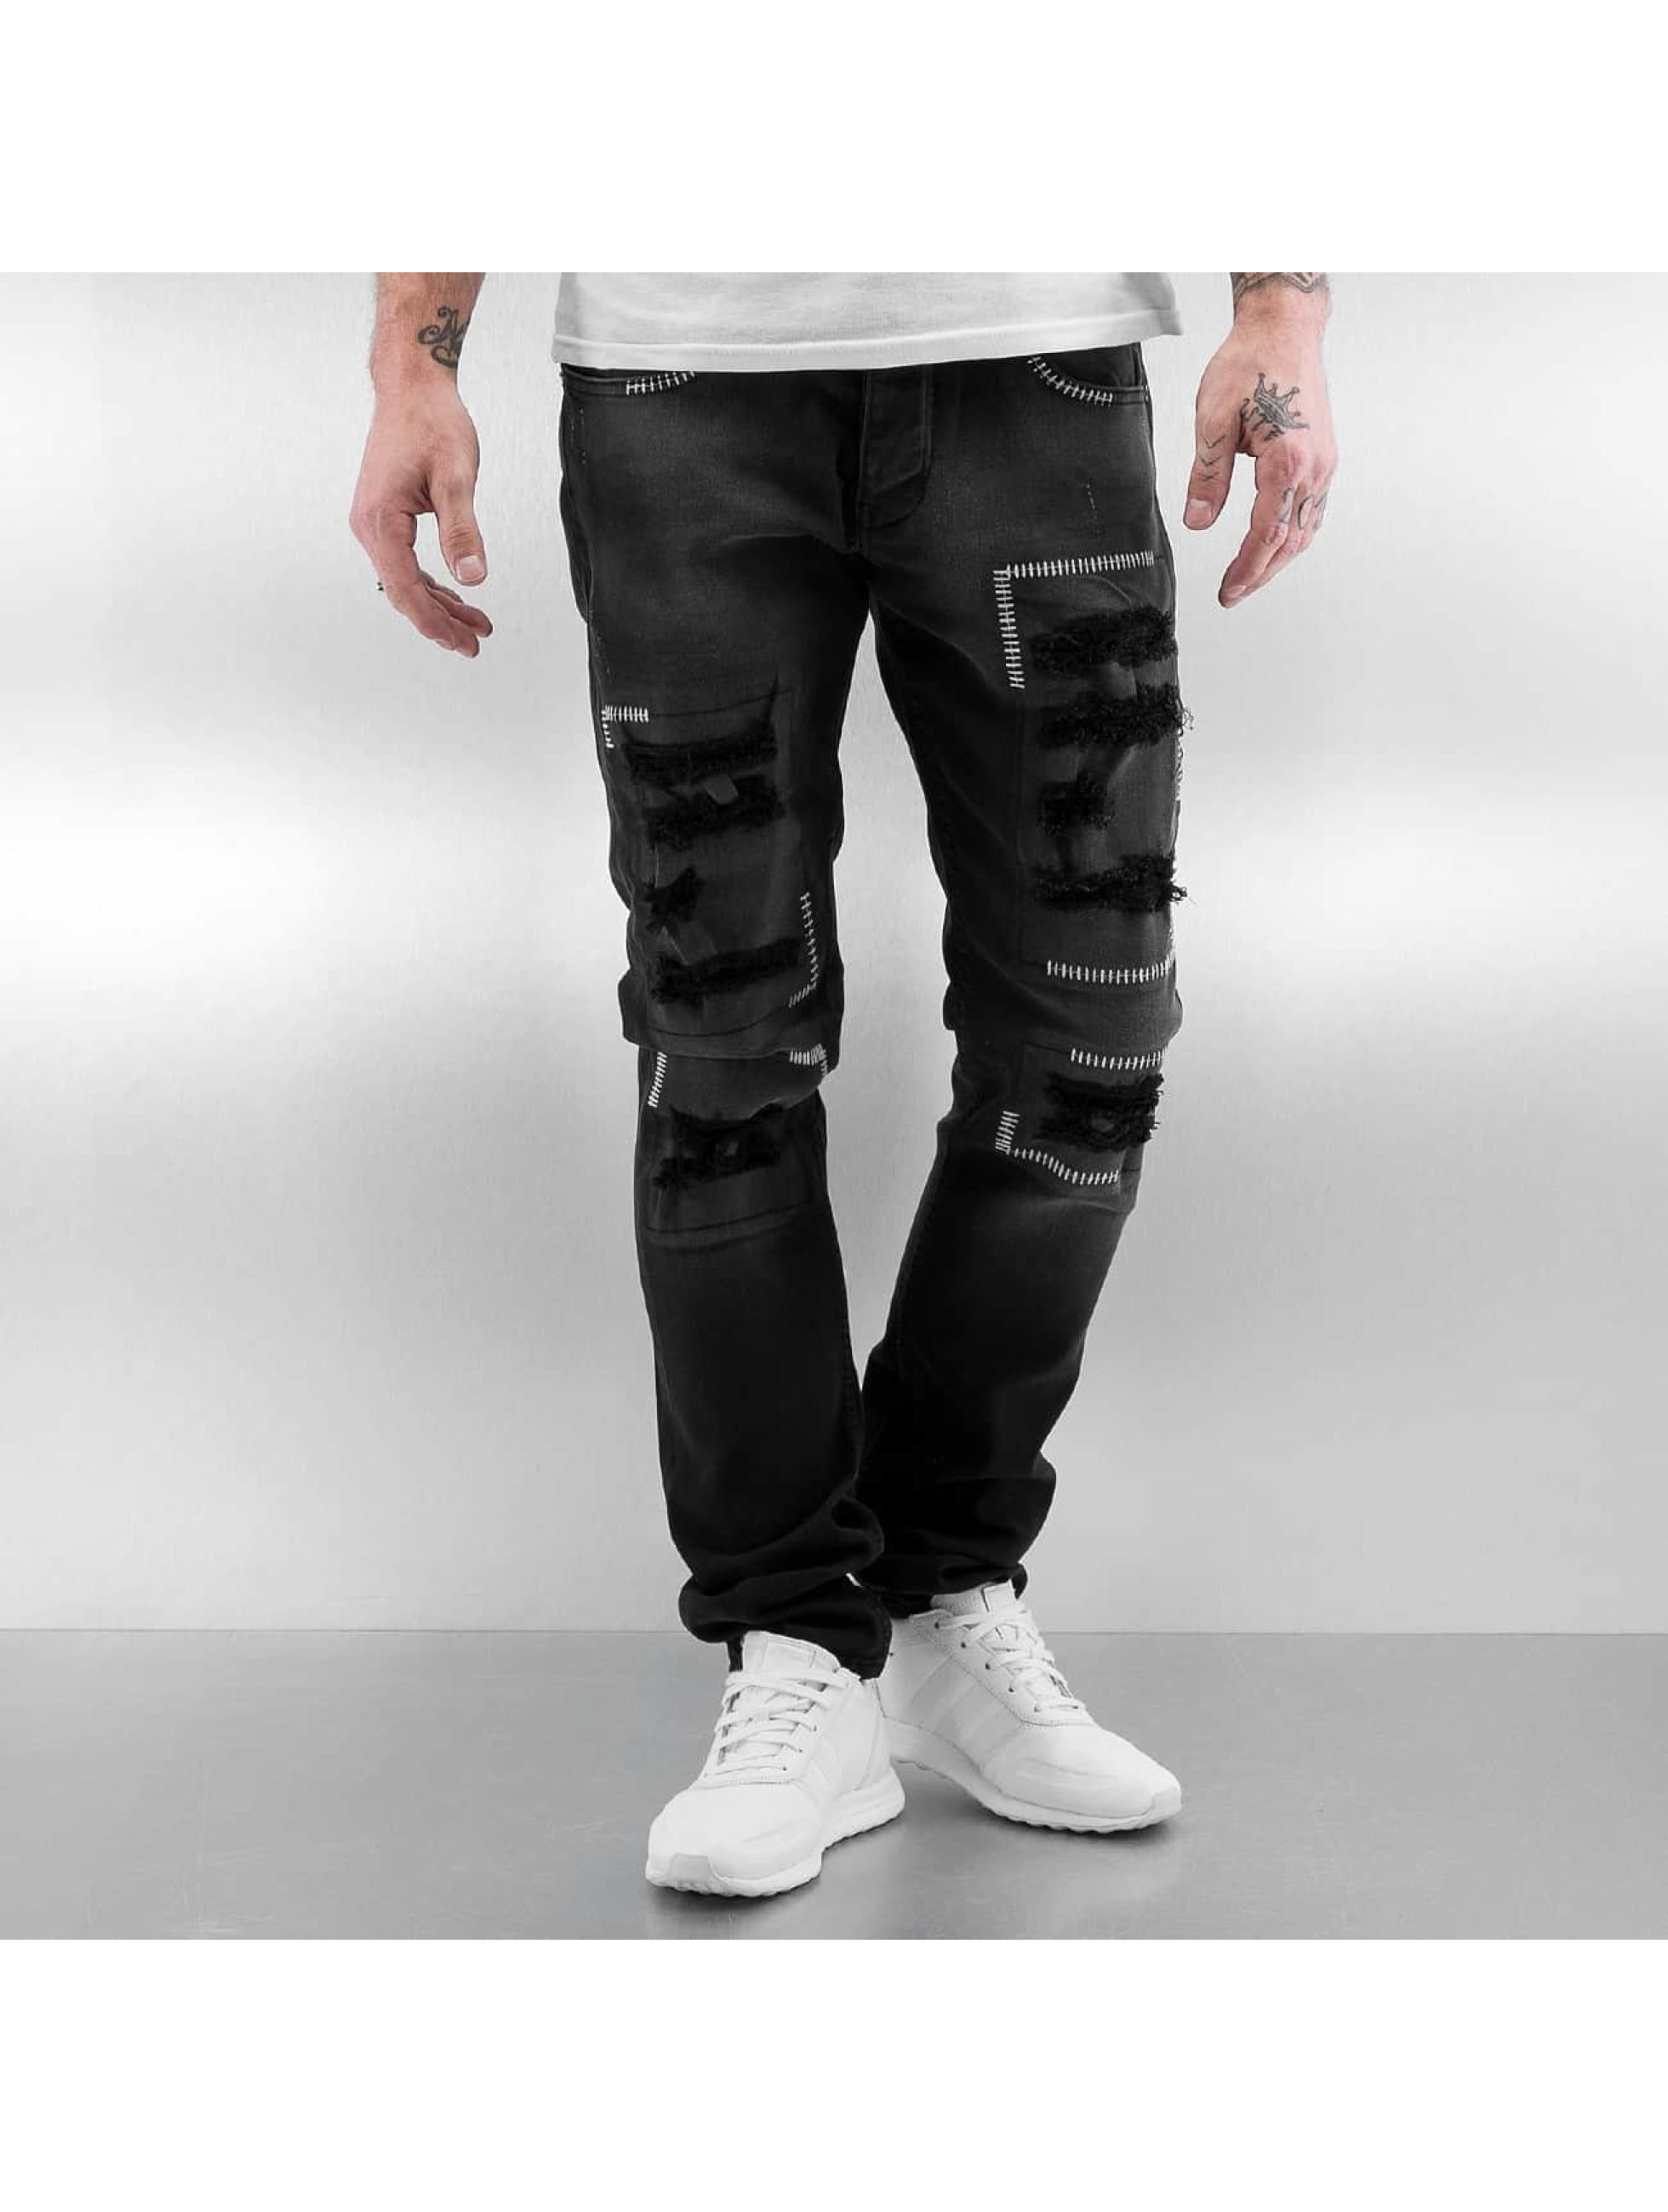 2Y / Slim Fit Jeans Stitch in black W 29